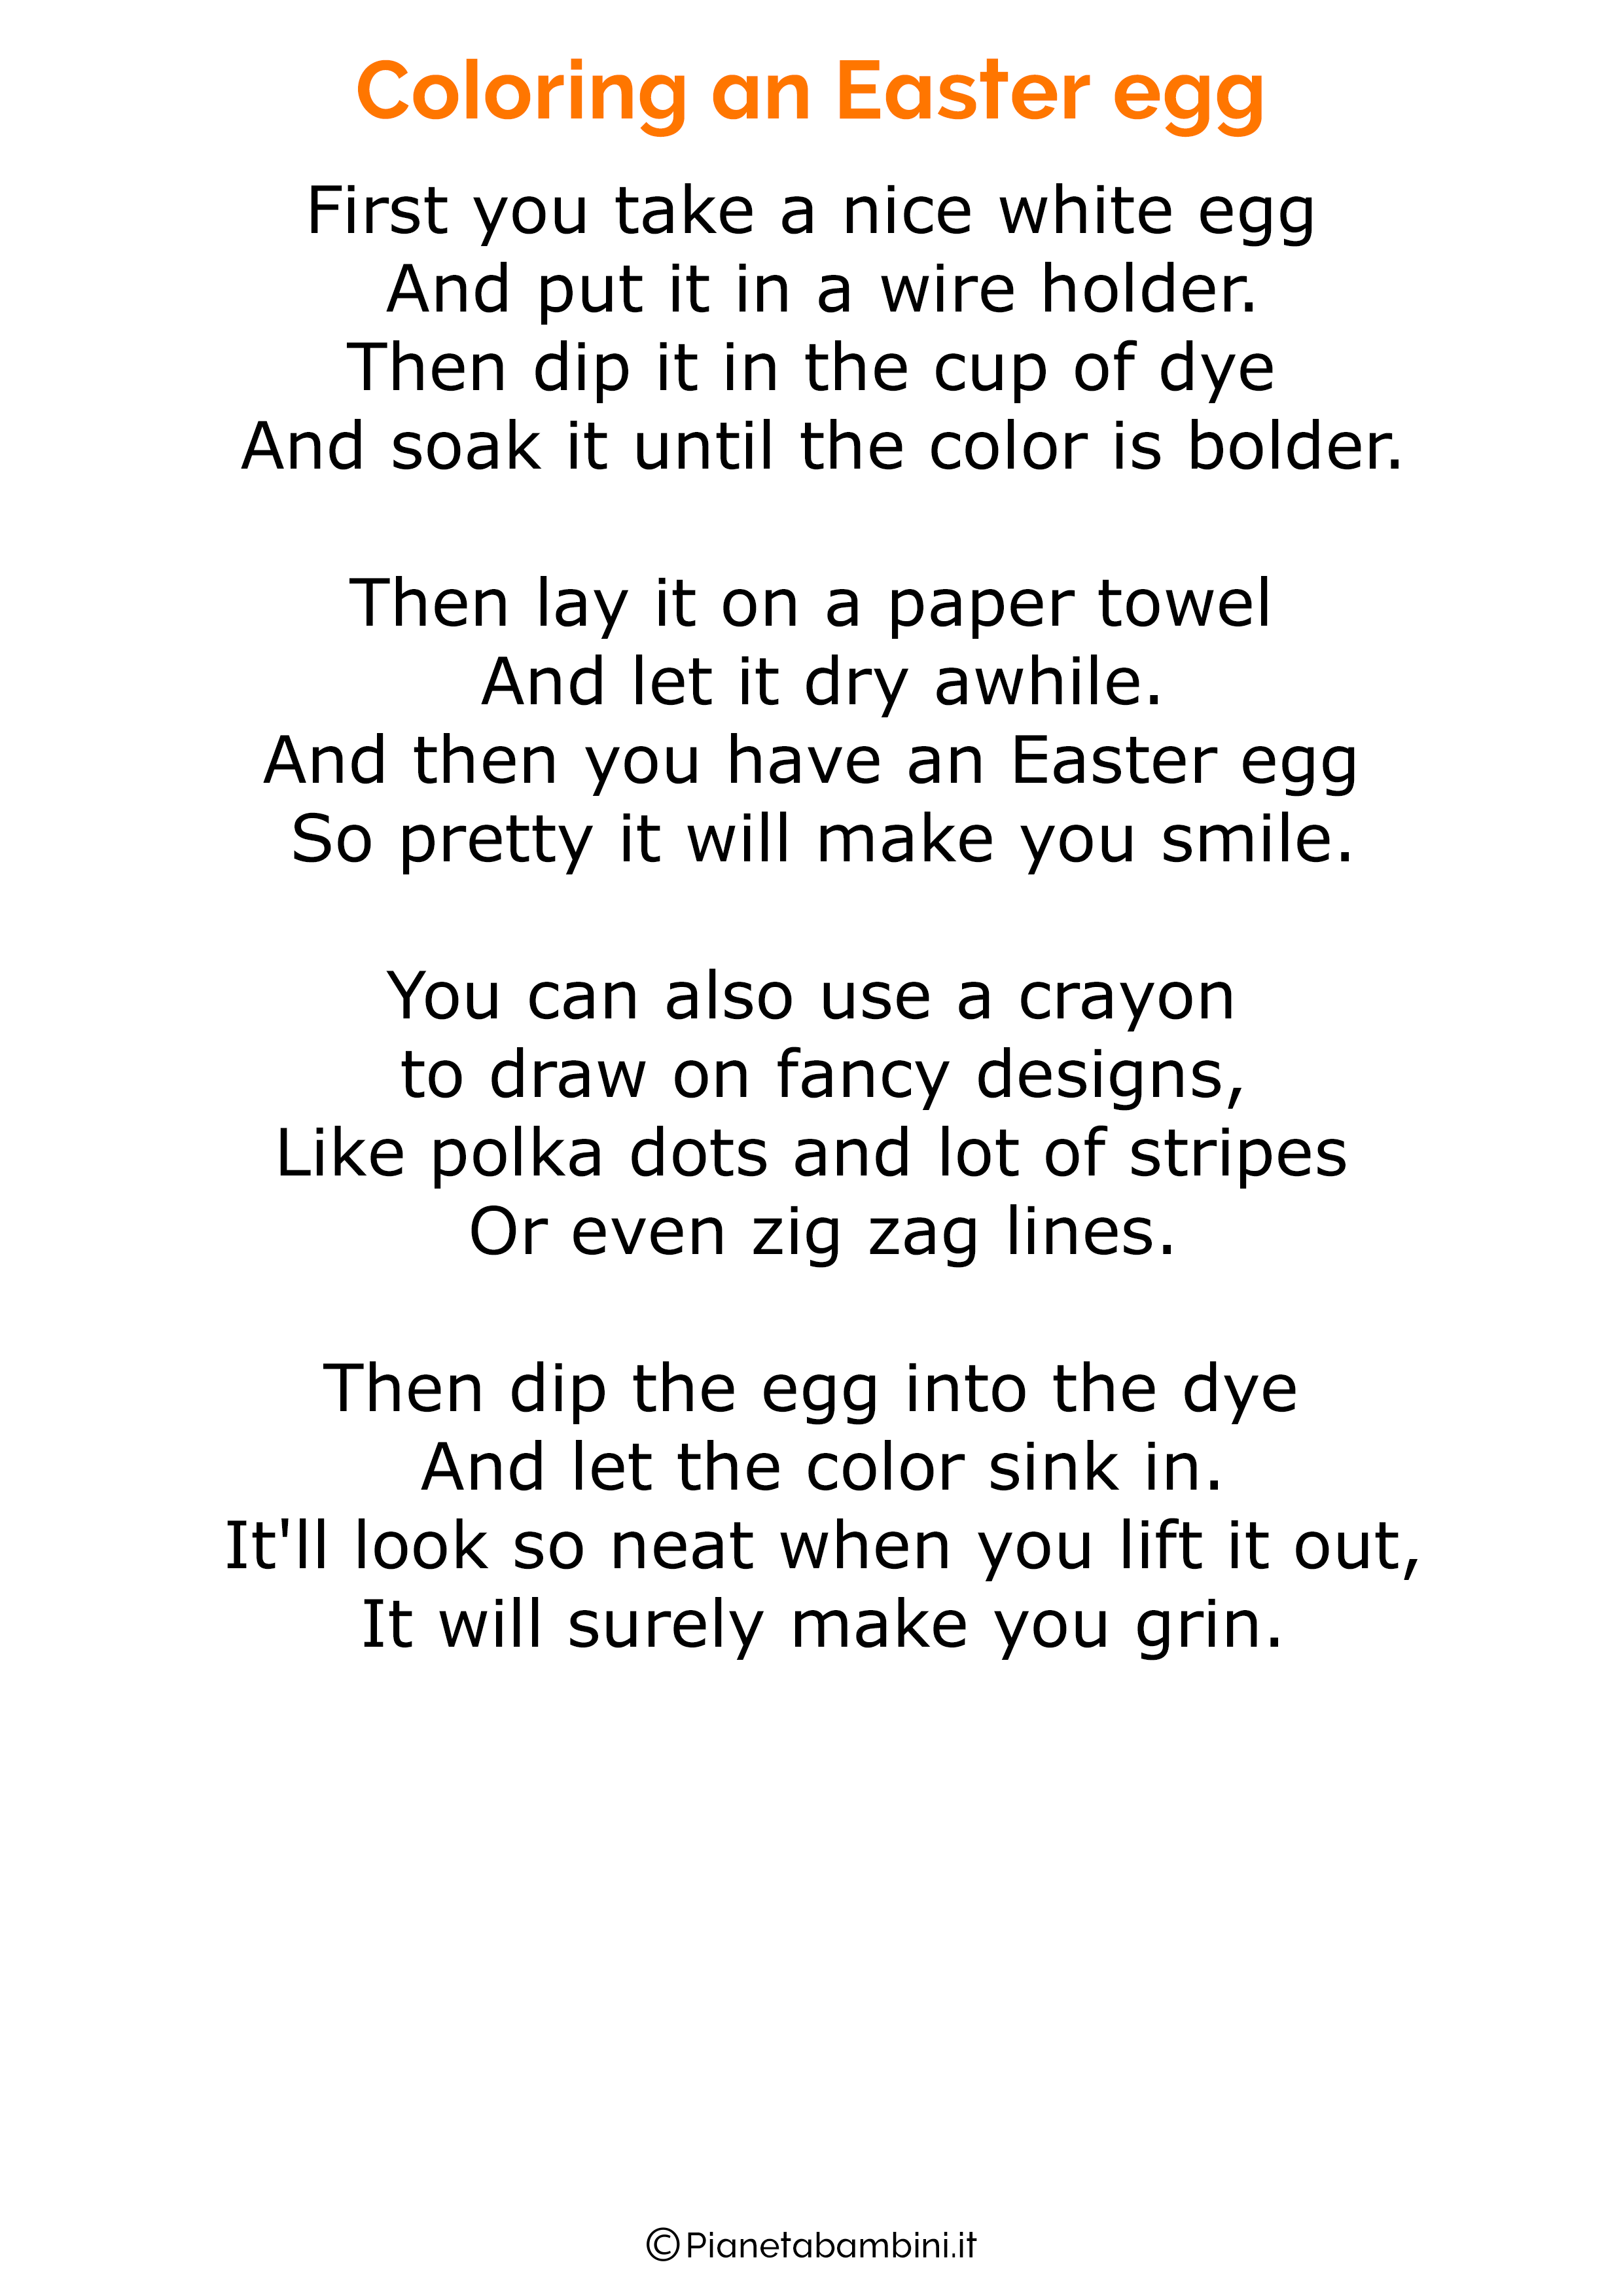 Poesie di Pasqua in inglese per bambini 02